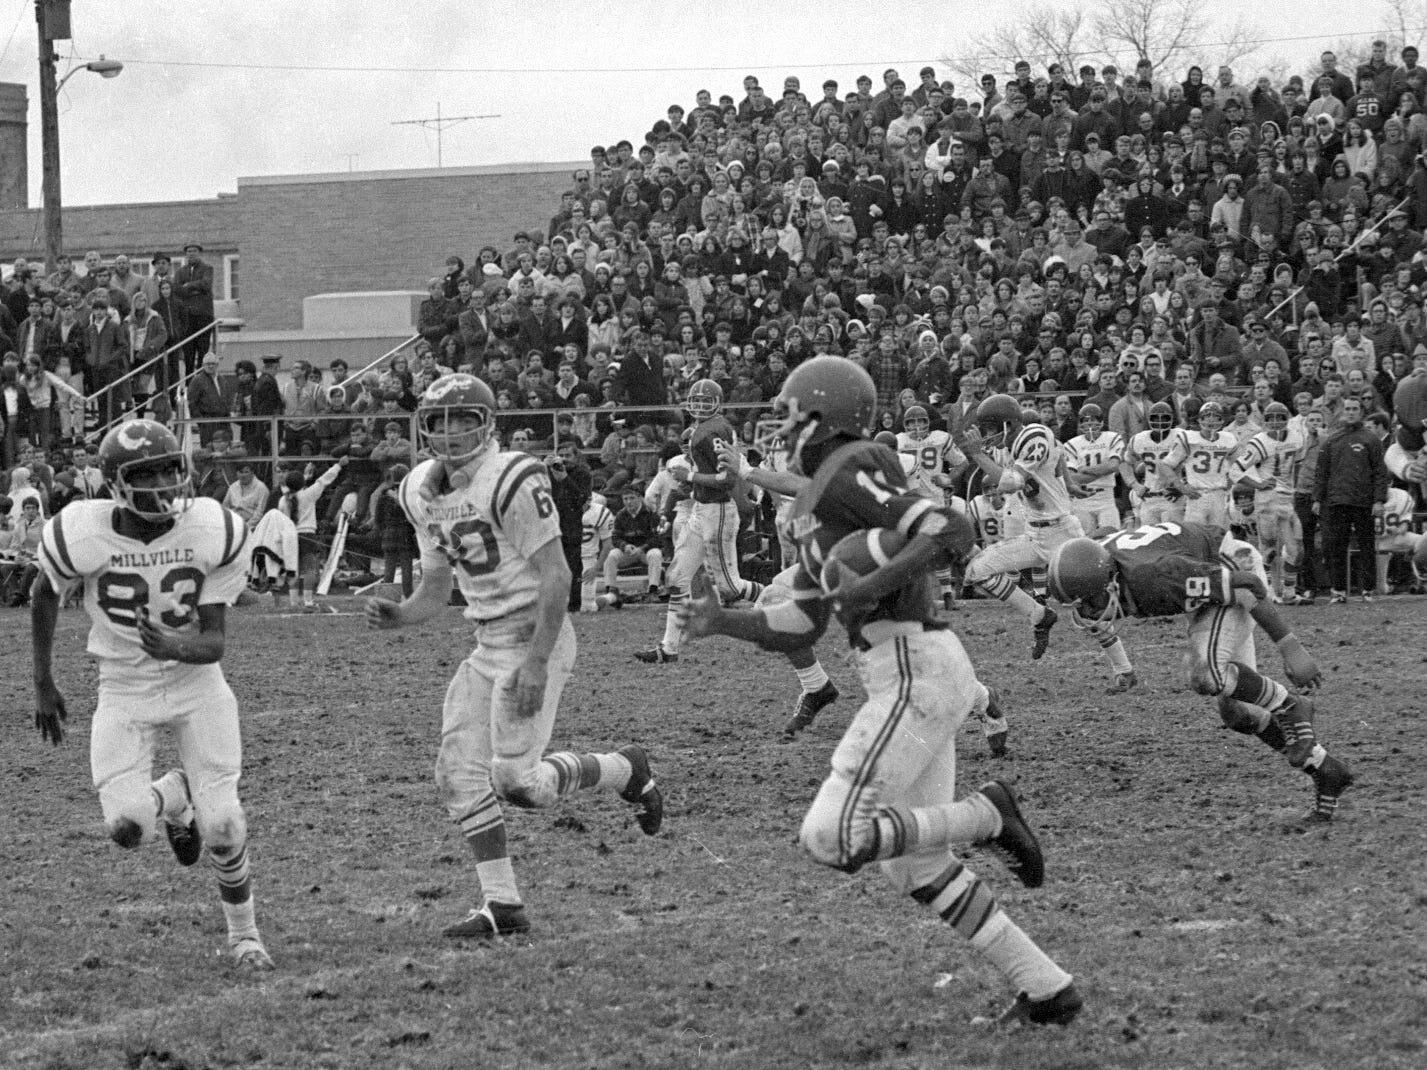 Football Vineland vs Millville 1969